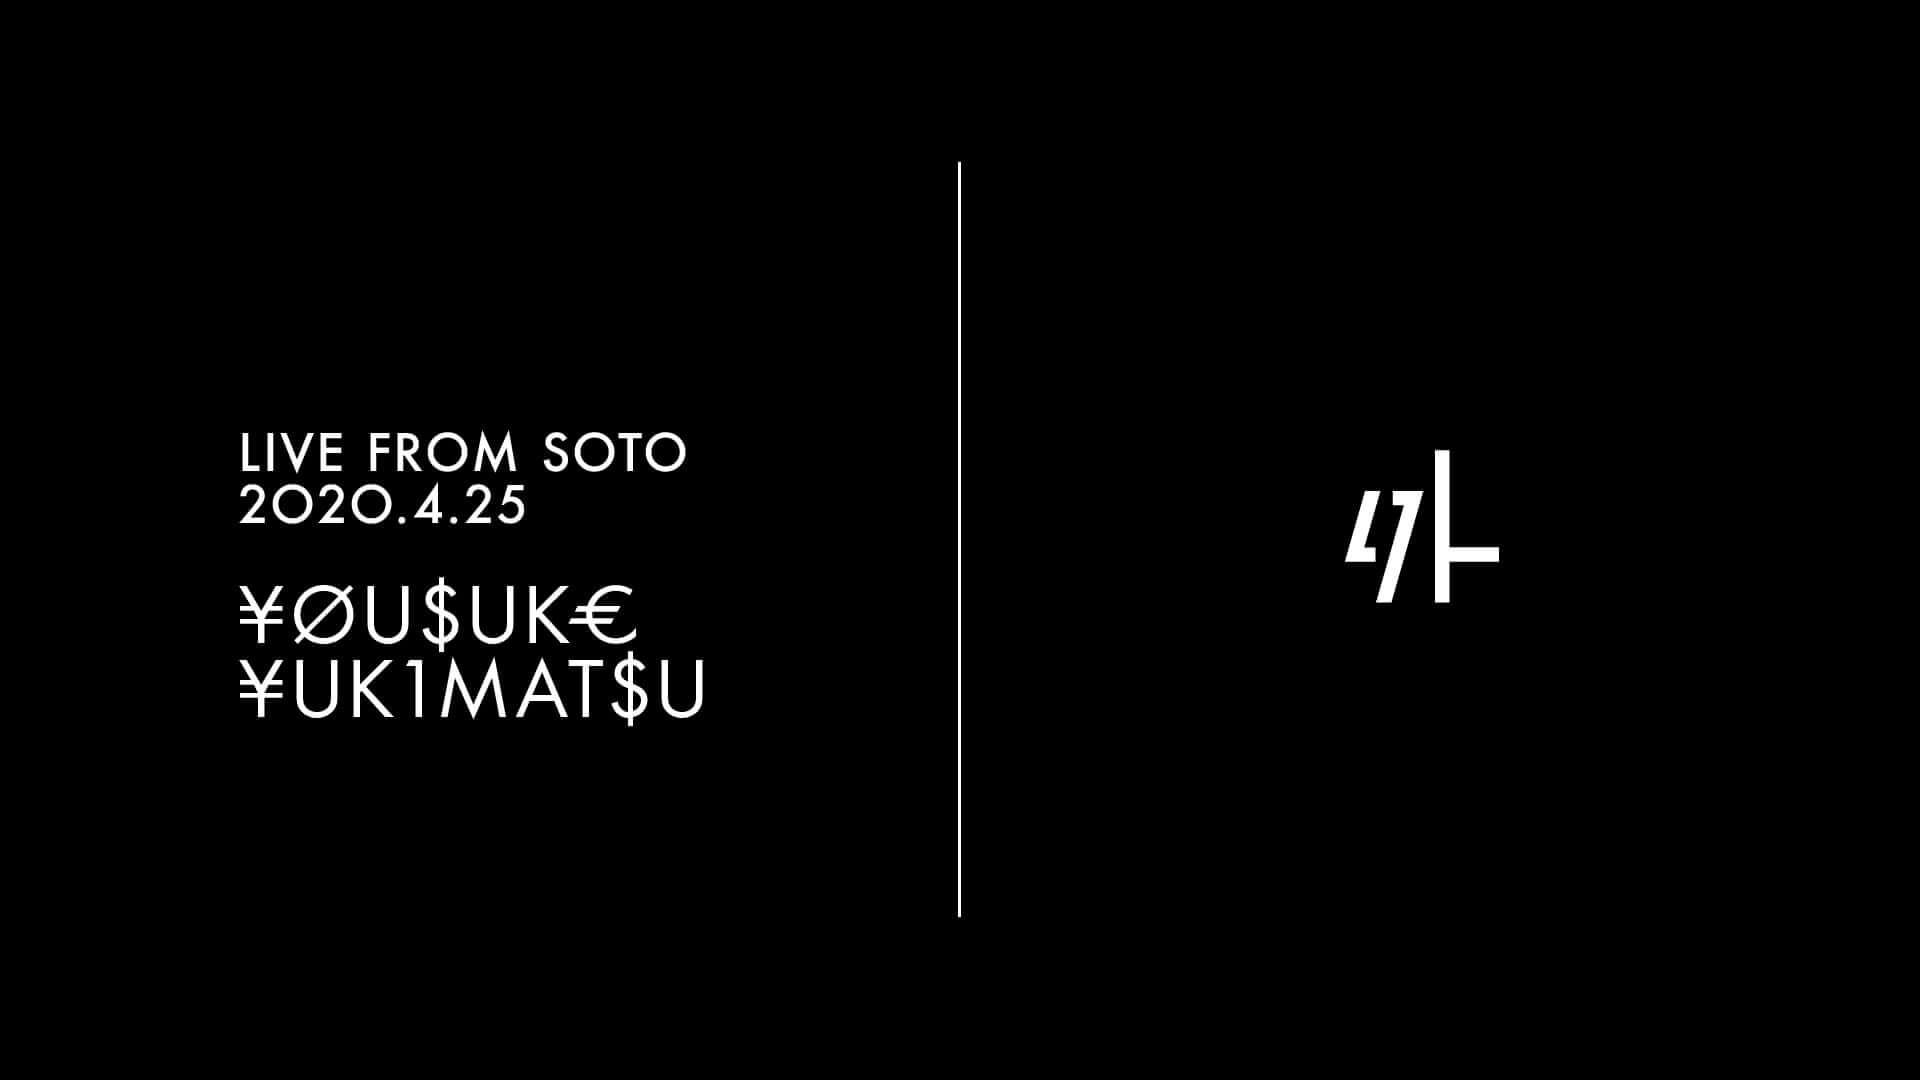 ¥ØU$UK€ ¥UK1MAT$Uの3時間DJセットが京都のライブハウス「外」から生配信決定! music200422_soto_kyoto_1-1920x1080